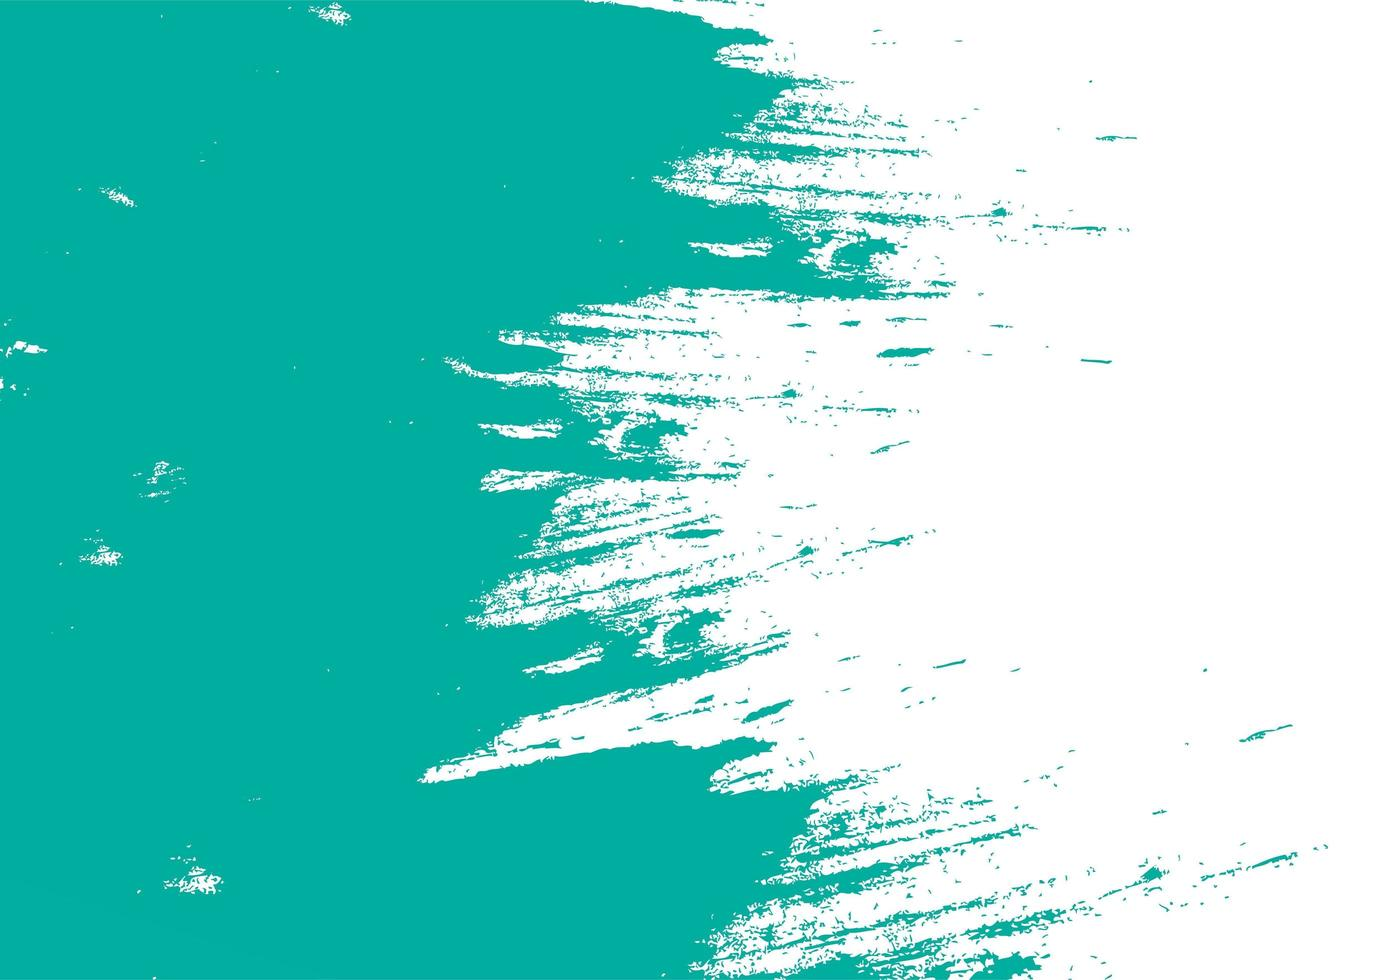 Teal Green Brushstroke Texture vector